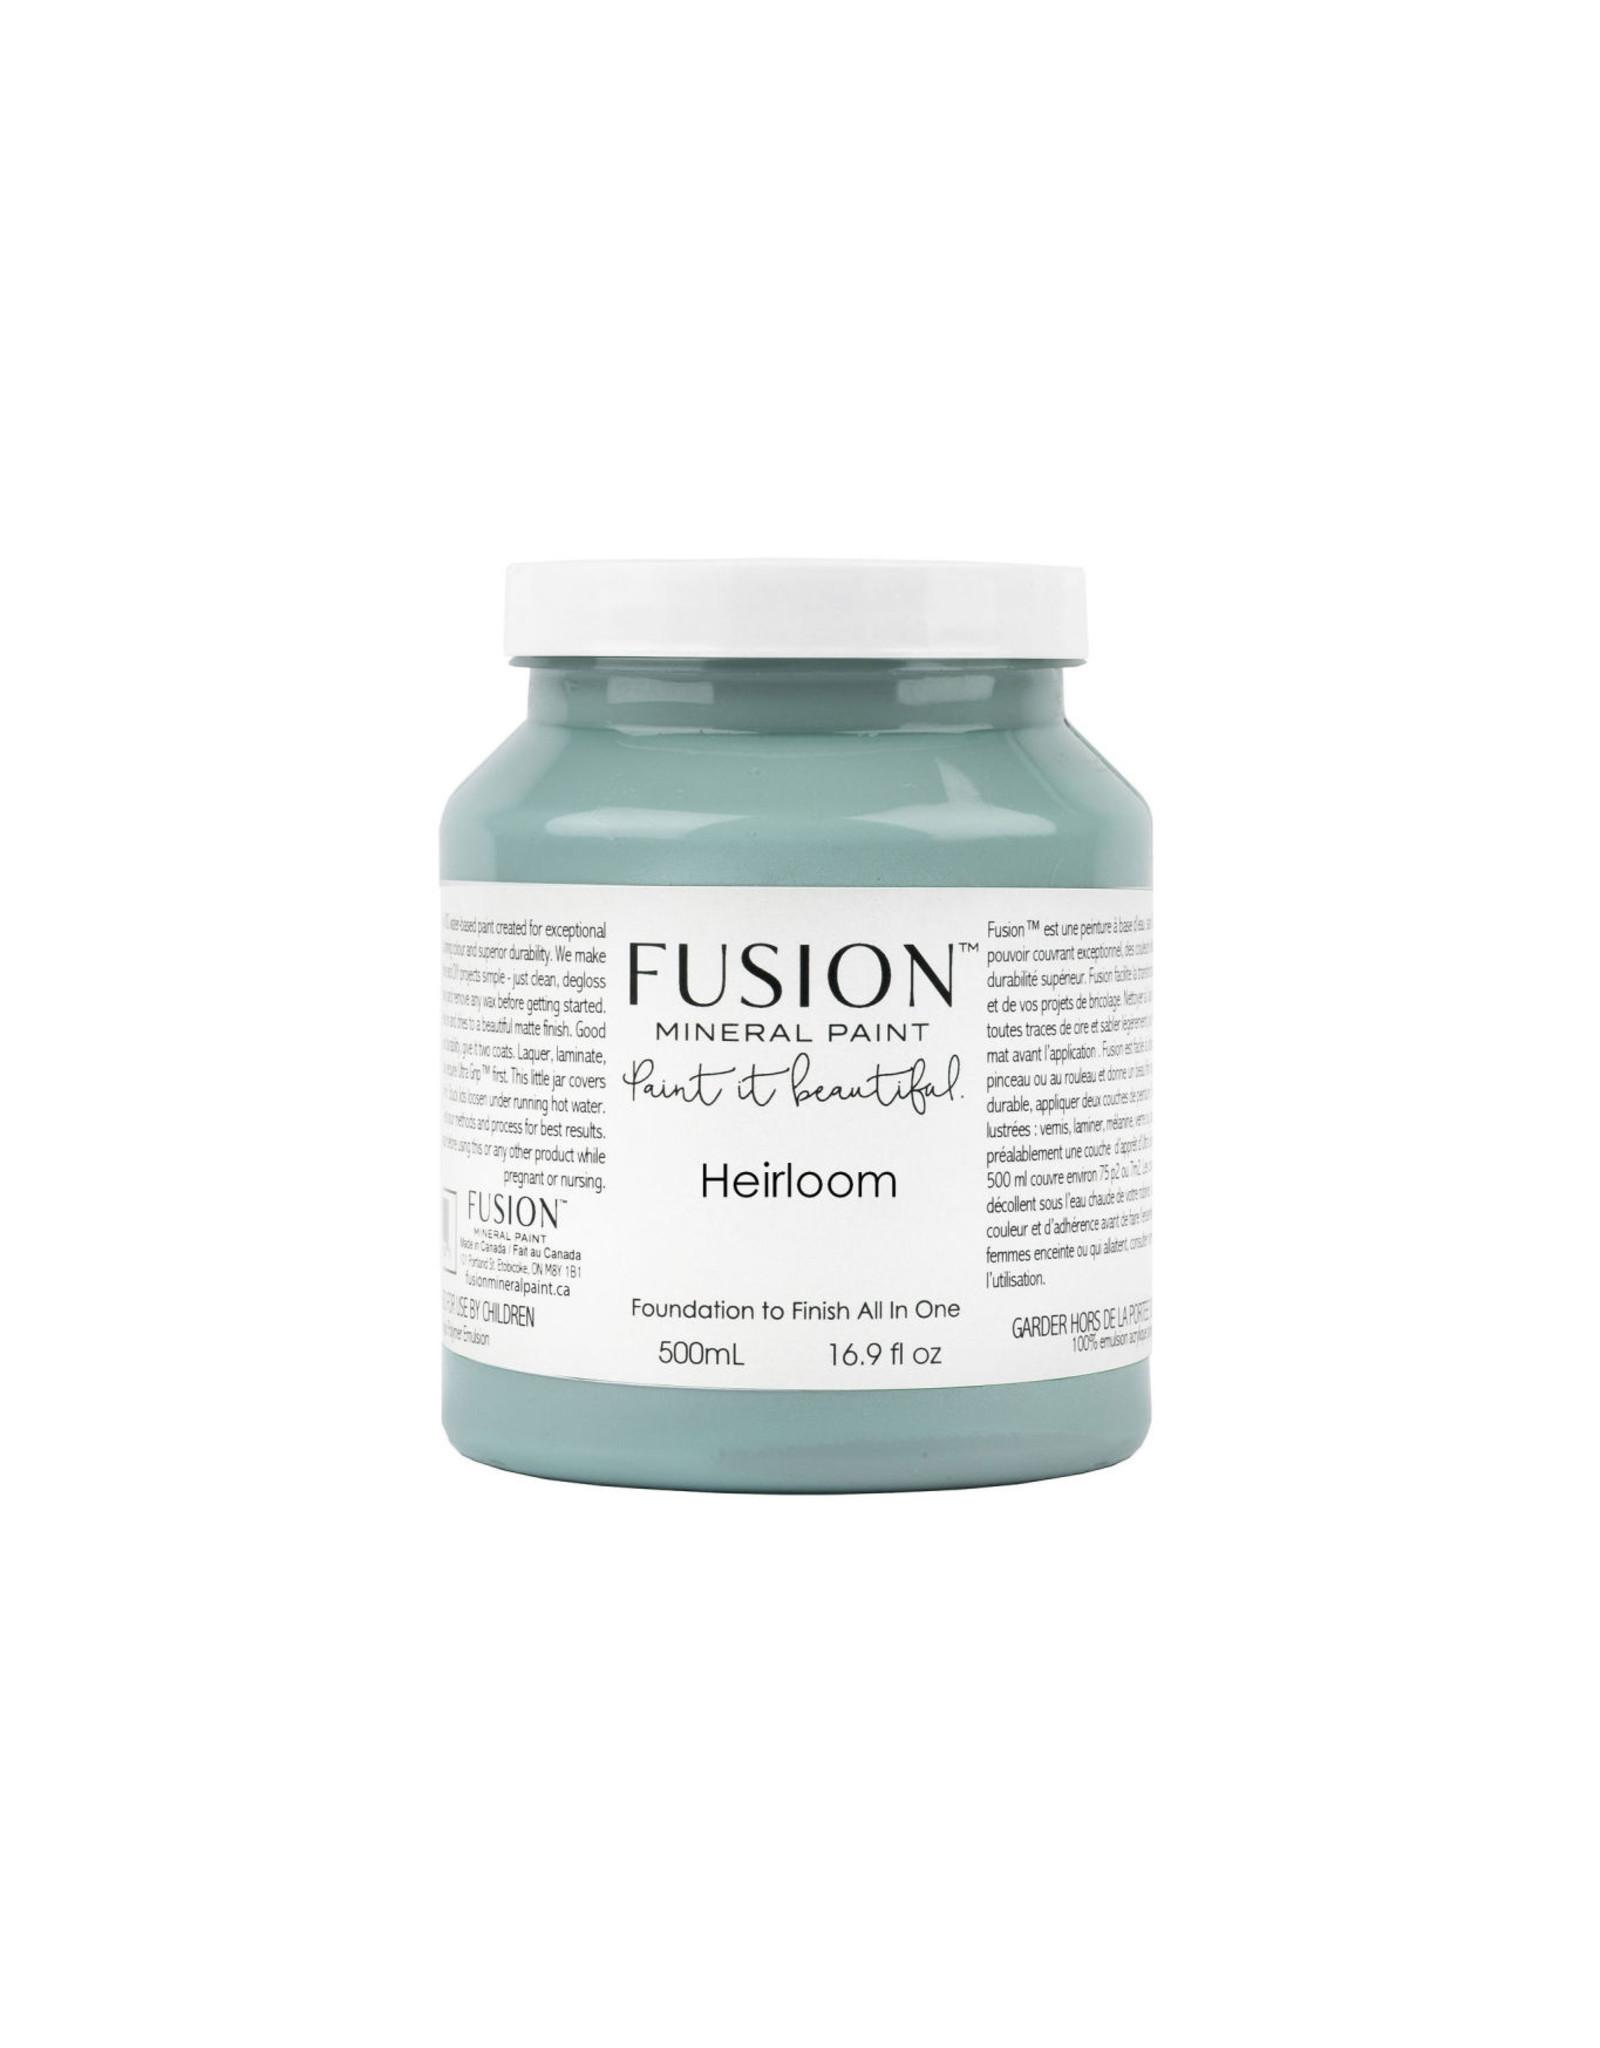 Fusion Mineral Paint Fusion Mineral Paint - Heirloom 500ml